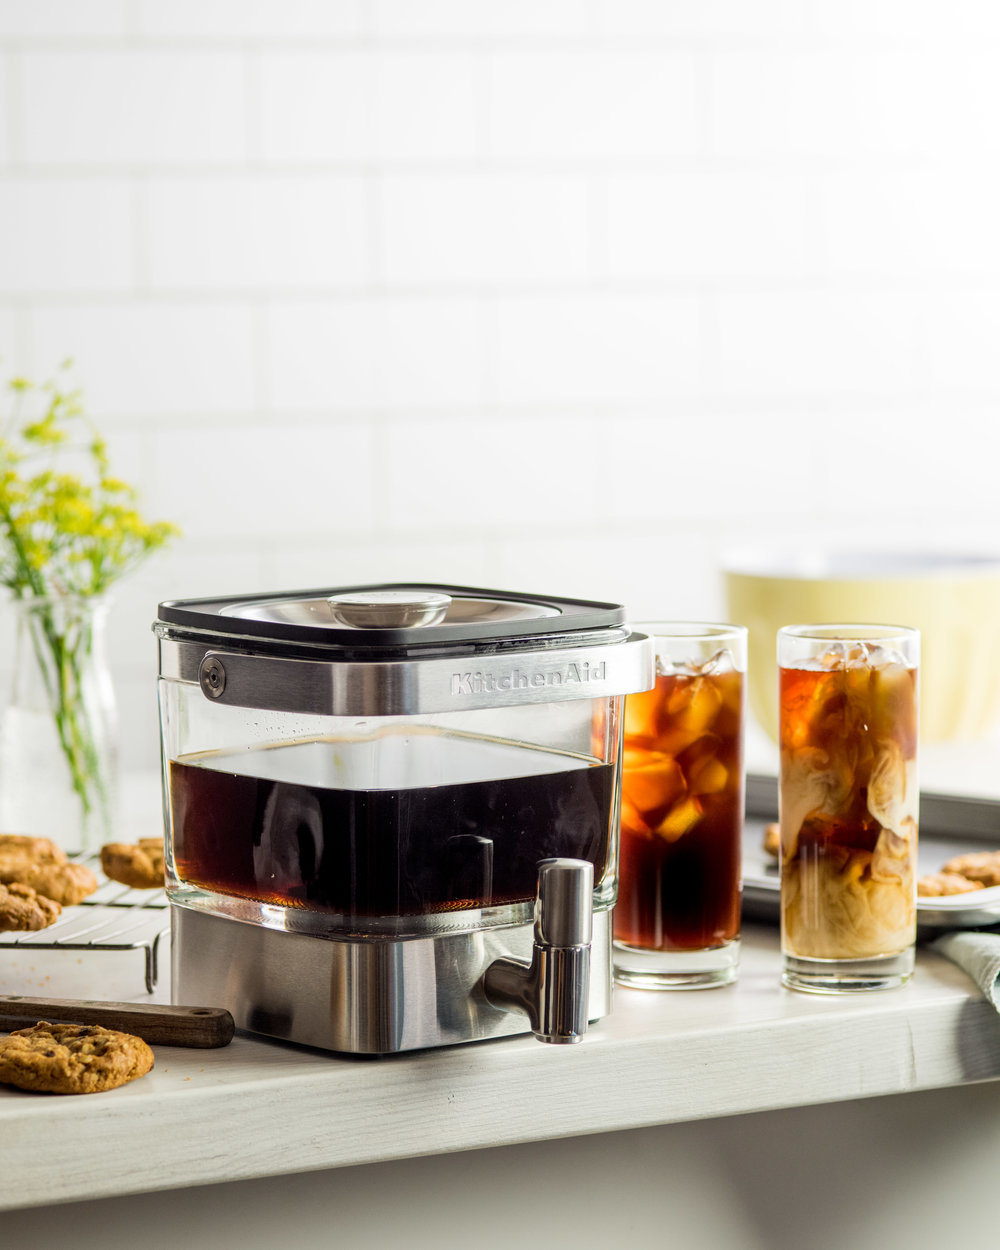 The KitchenAid Cold Brew Coffee Maker